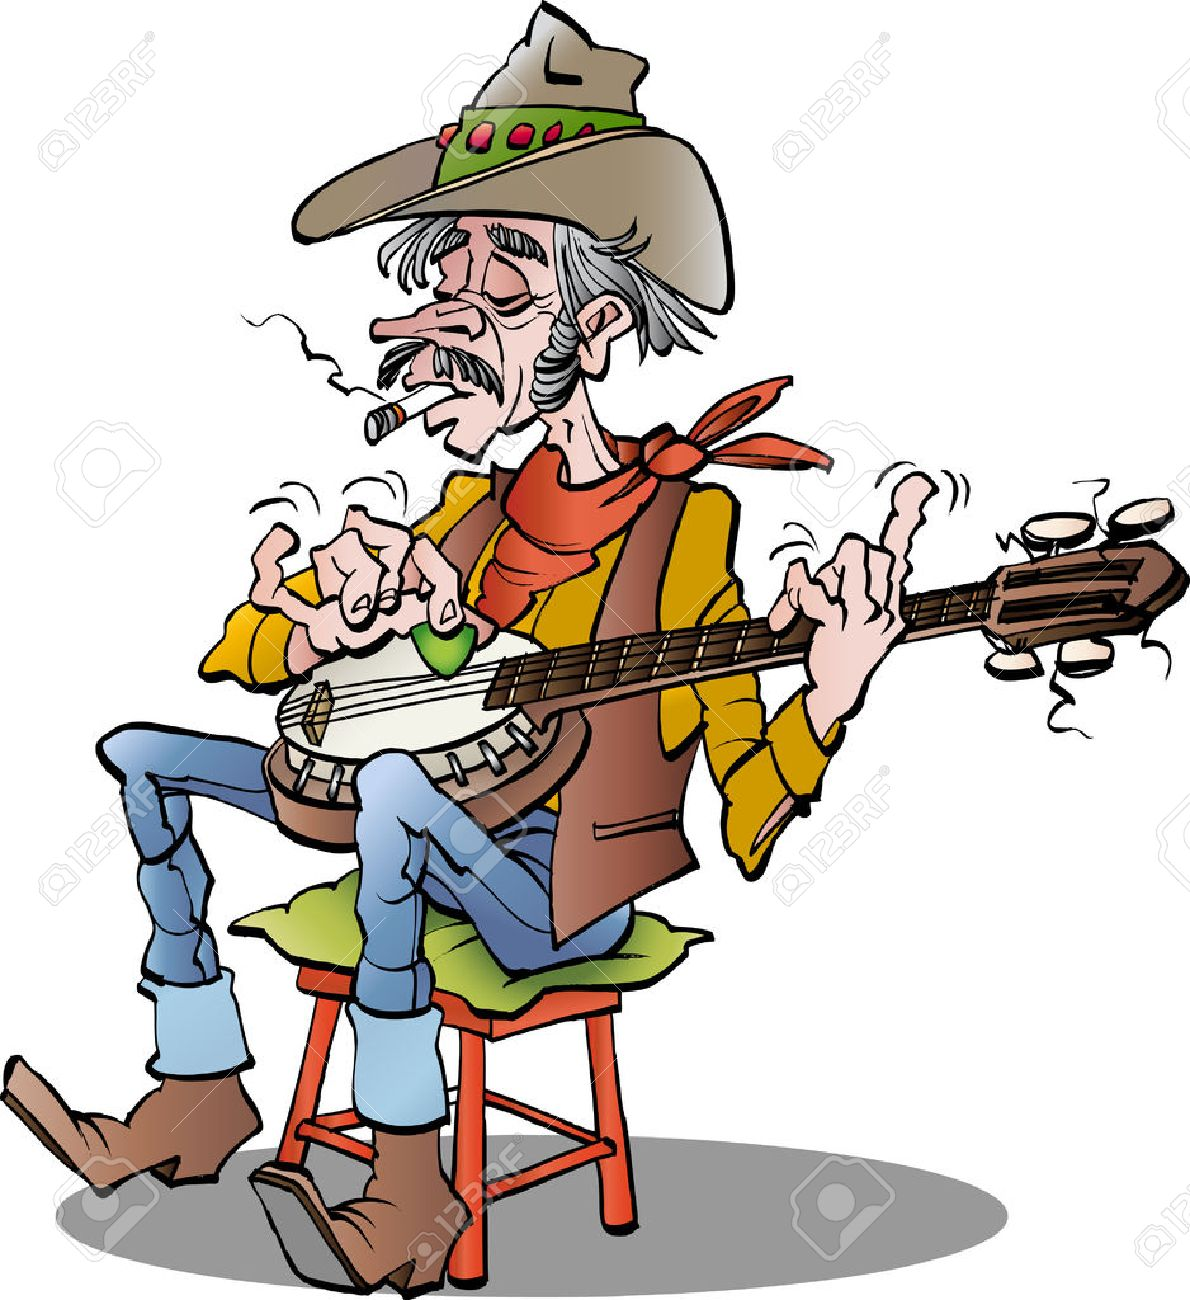 445 hillbilly stock vector illustration and royalty free hillbilly rh 123rf com hillbilly clipart free hillbilly clipart free